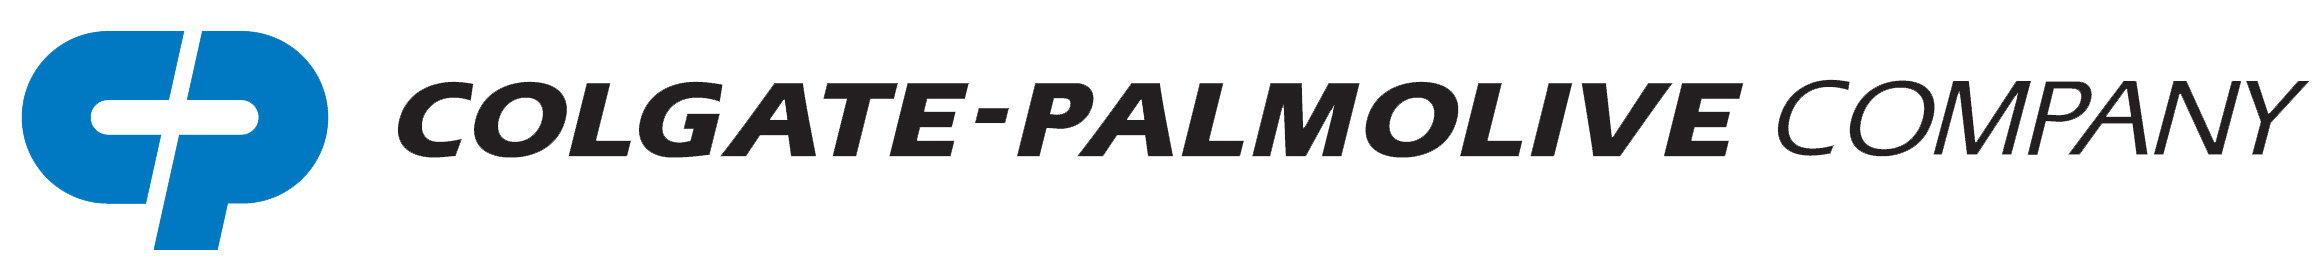 CP_logo_external_clear.png